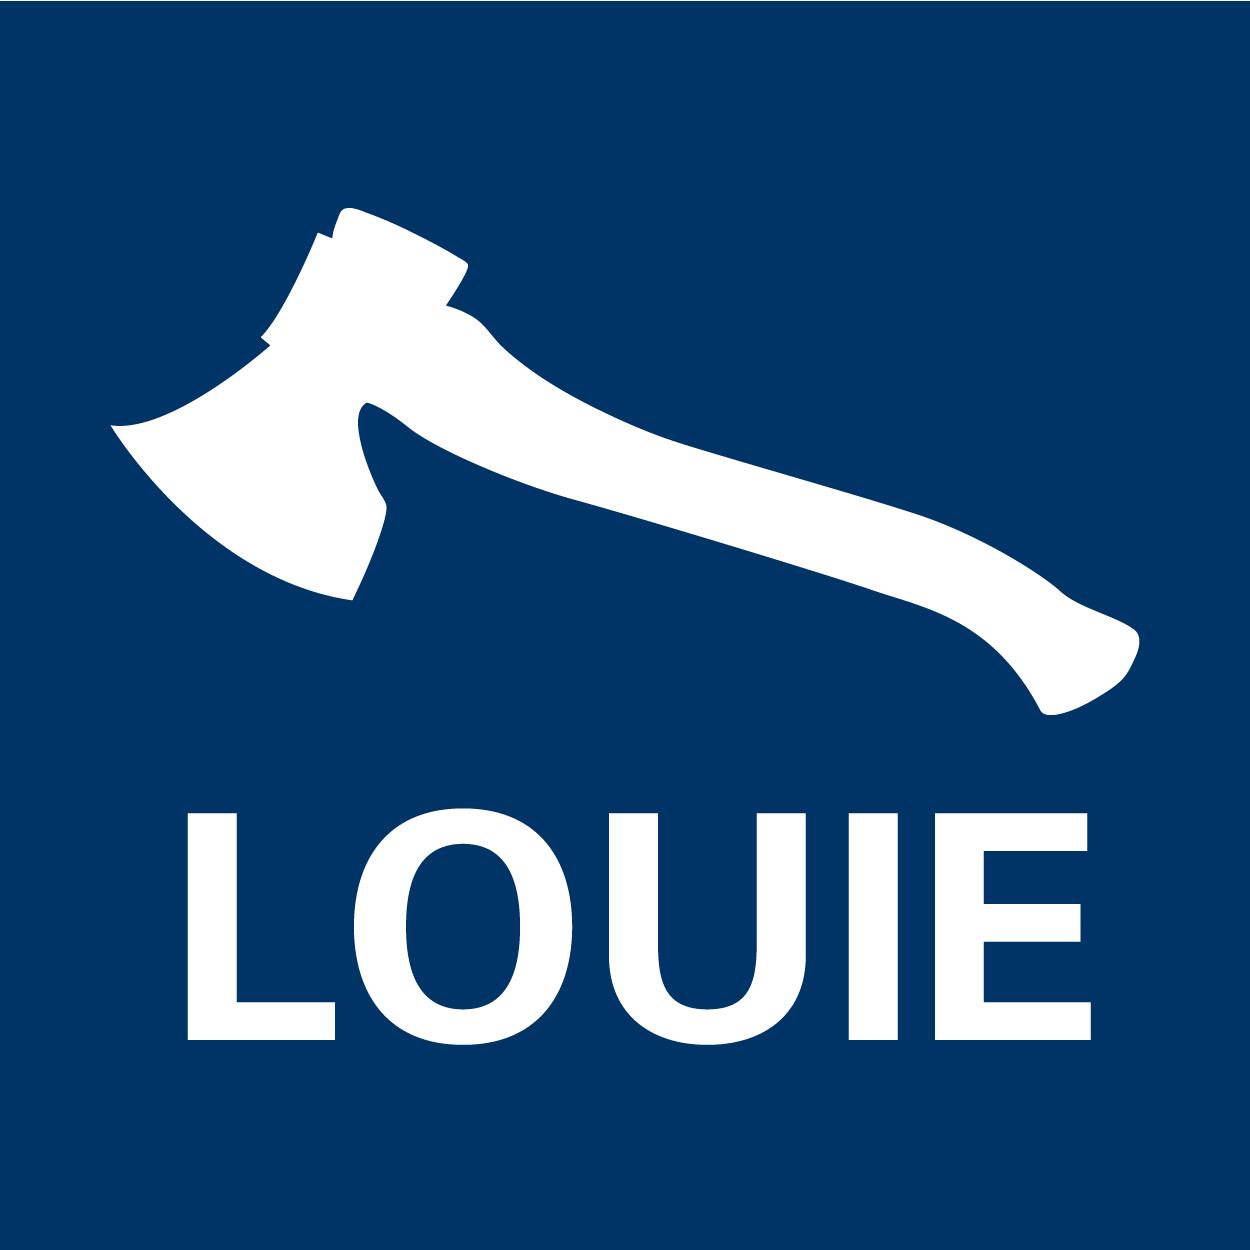 Access LOUIE